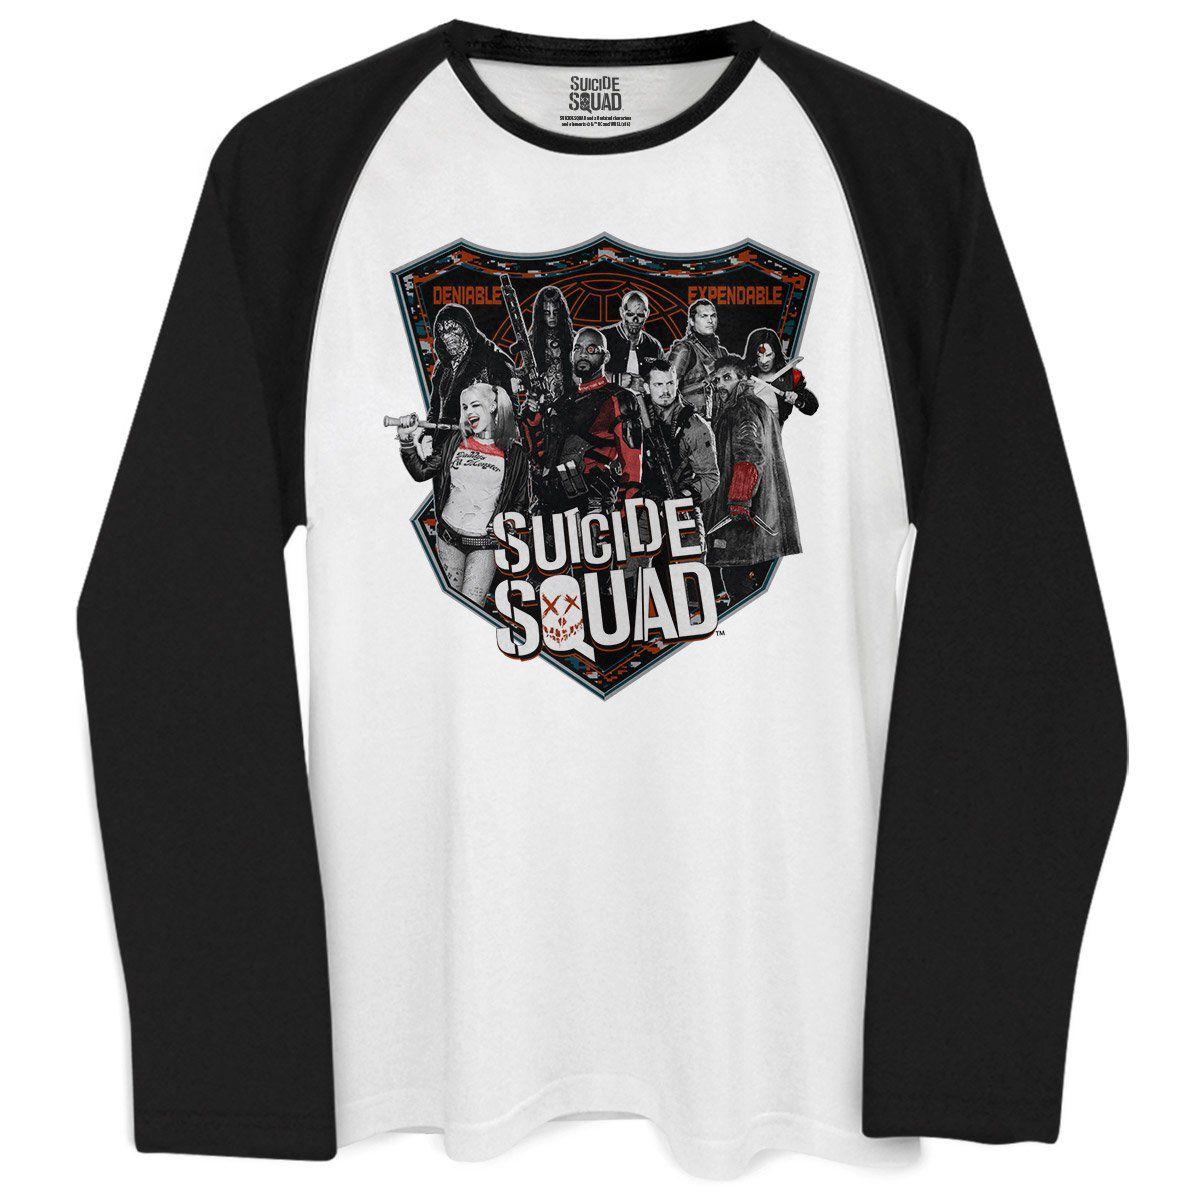 Camiseta Manga Longa Masculina Esquadrão Suicida Deniable Expendable  - bandUP Store Marketplace